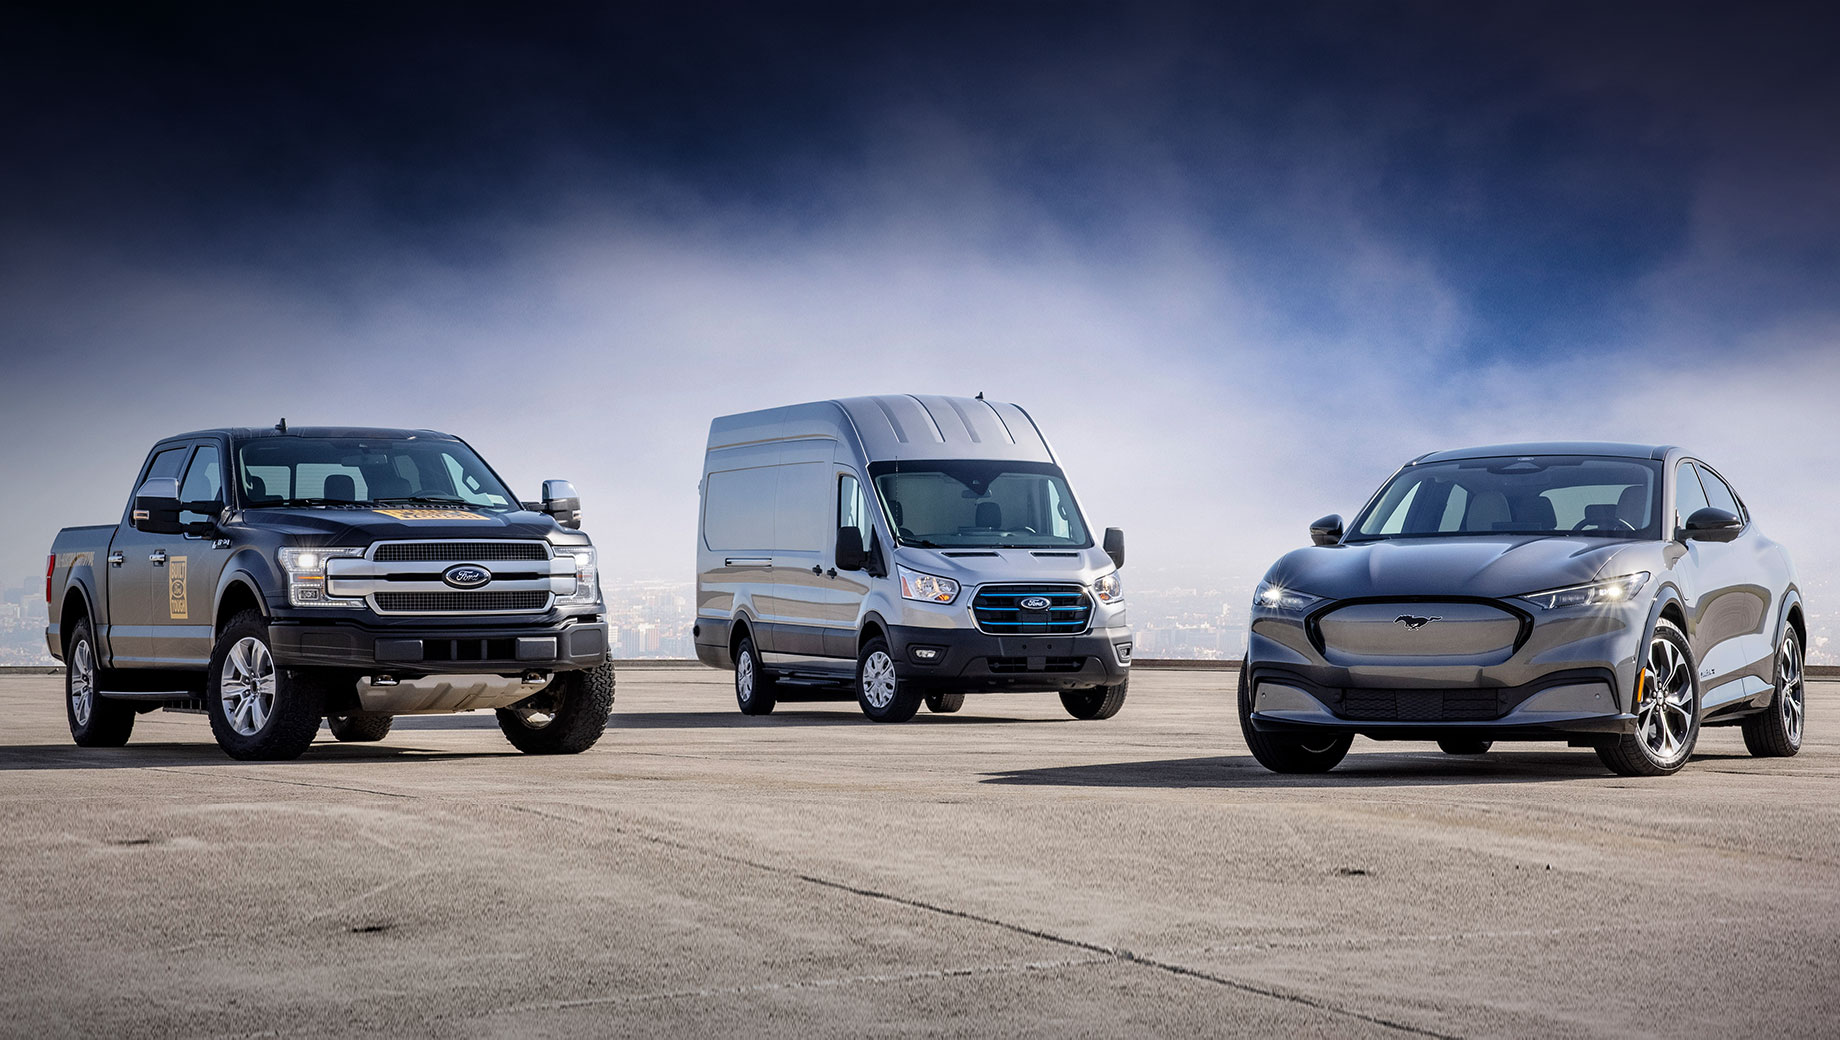 Ford электрифицирует все свои легковушки в Европе с 2026 года